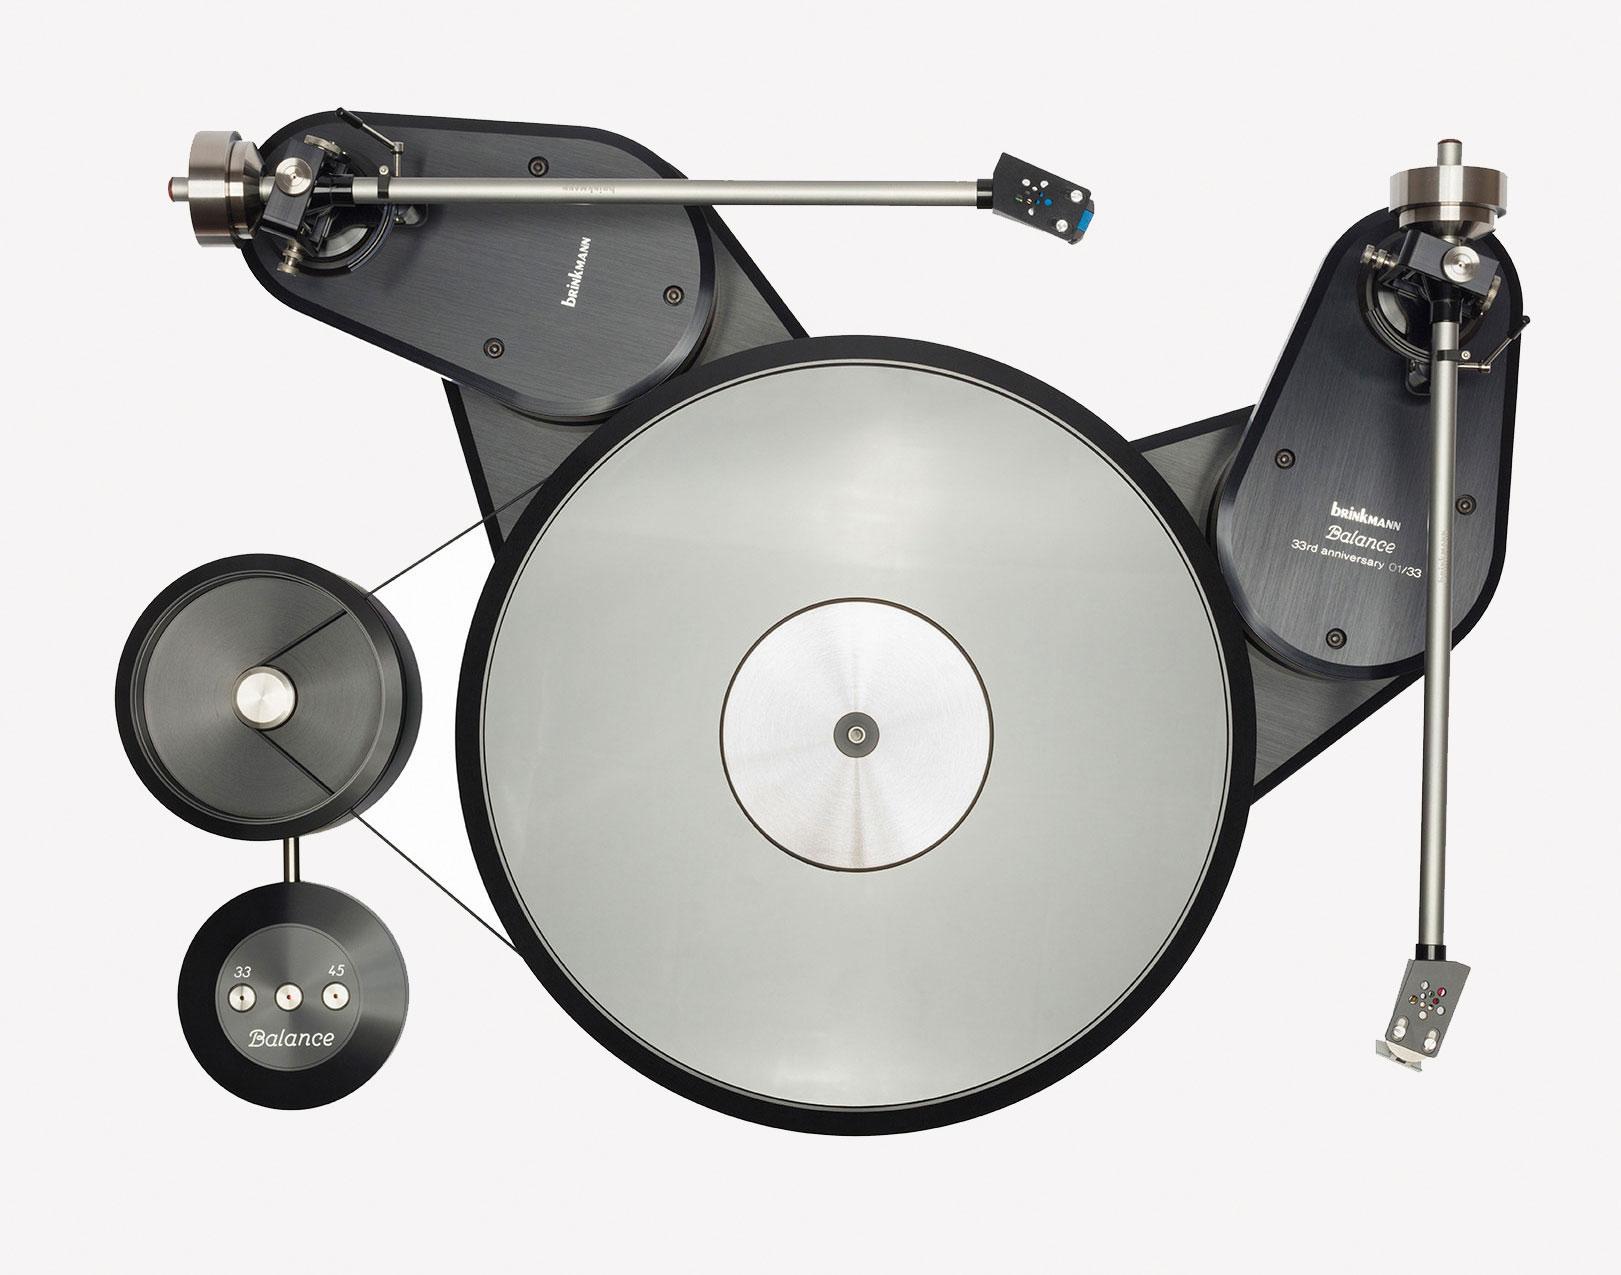 Balance Belt-Drive Turntable, 33rd anniversary edition, Brinkmann, 2018